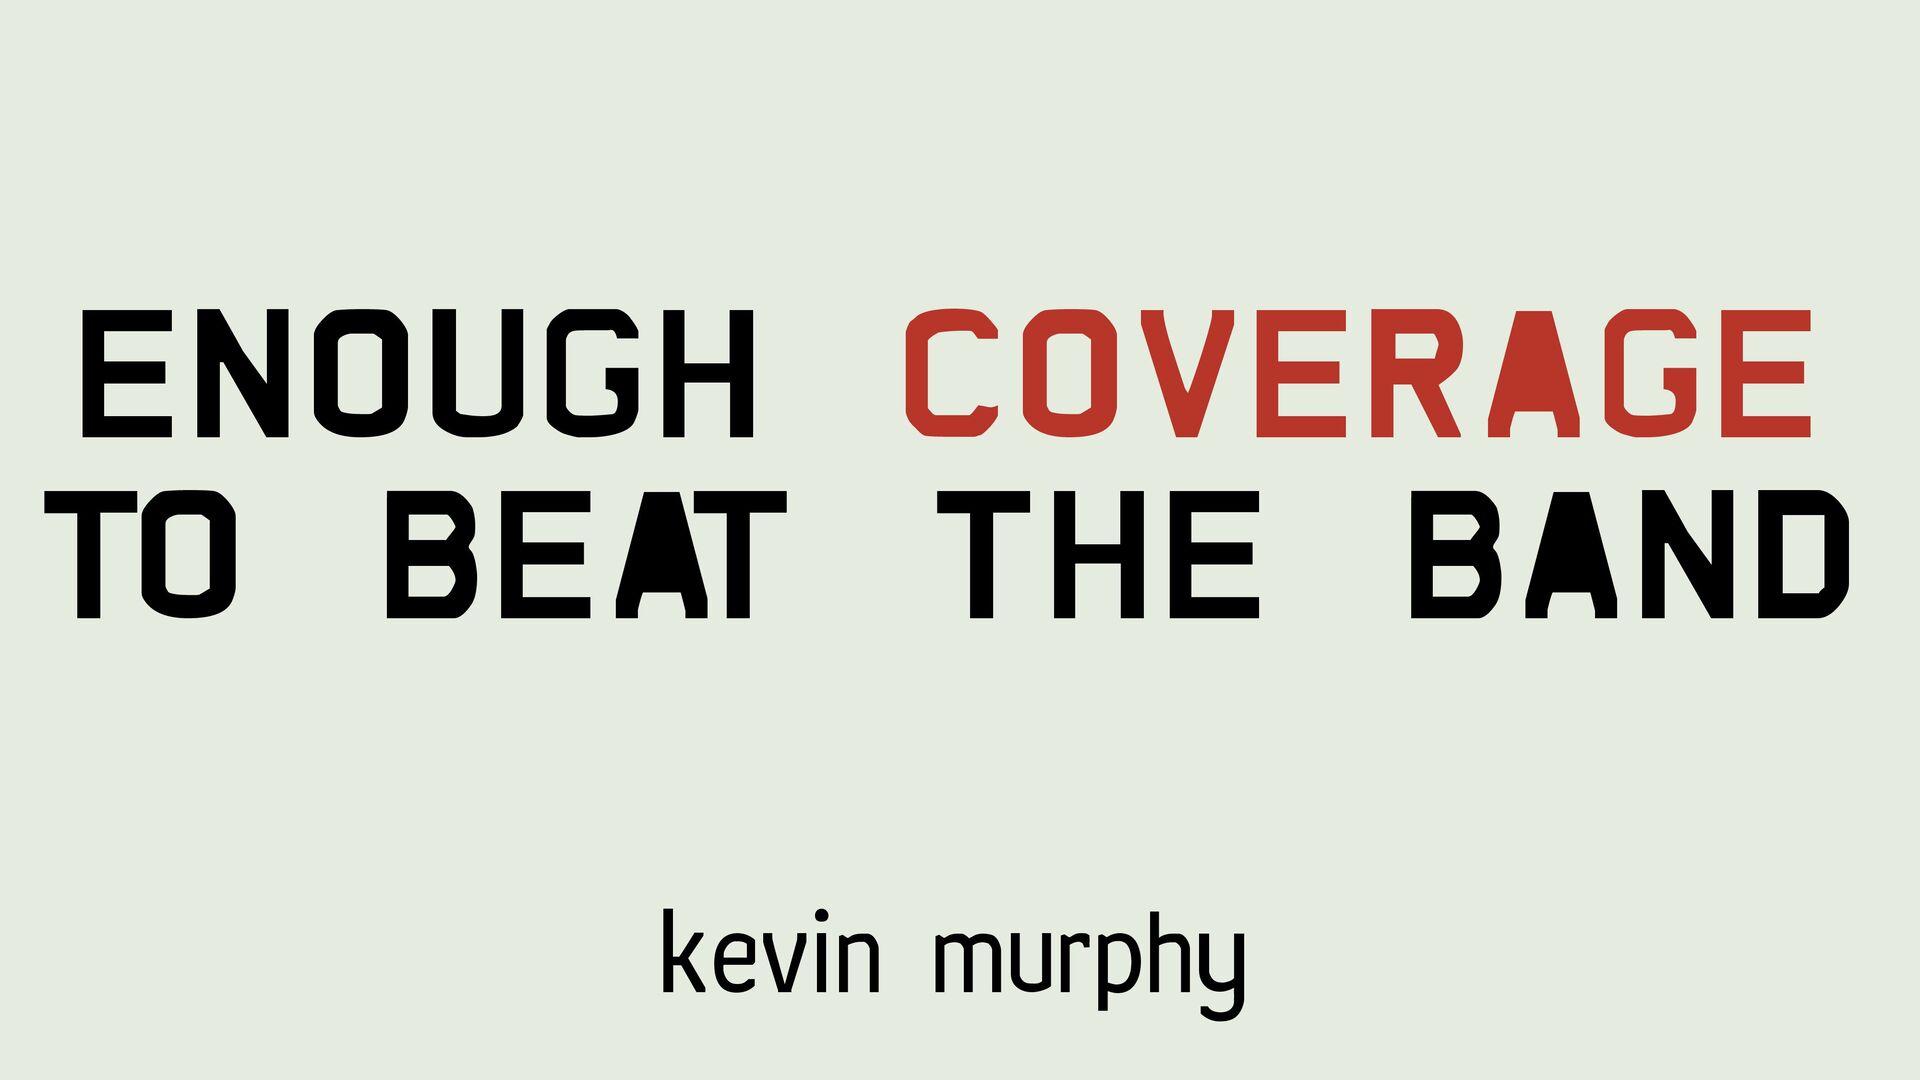 Nine Inch Nails CC BY-NC-SA 2.0